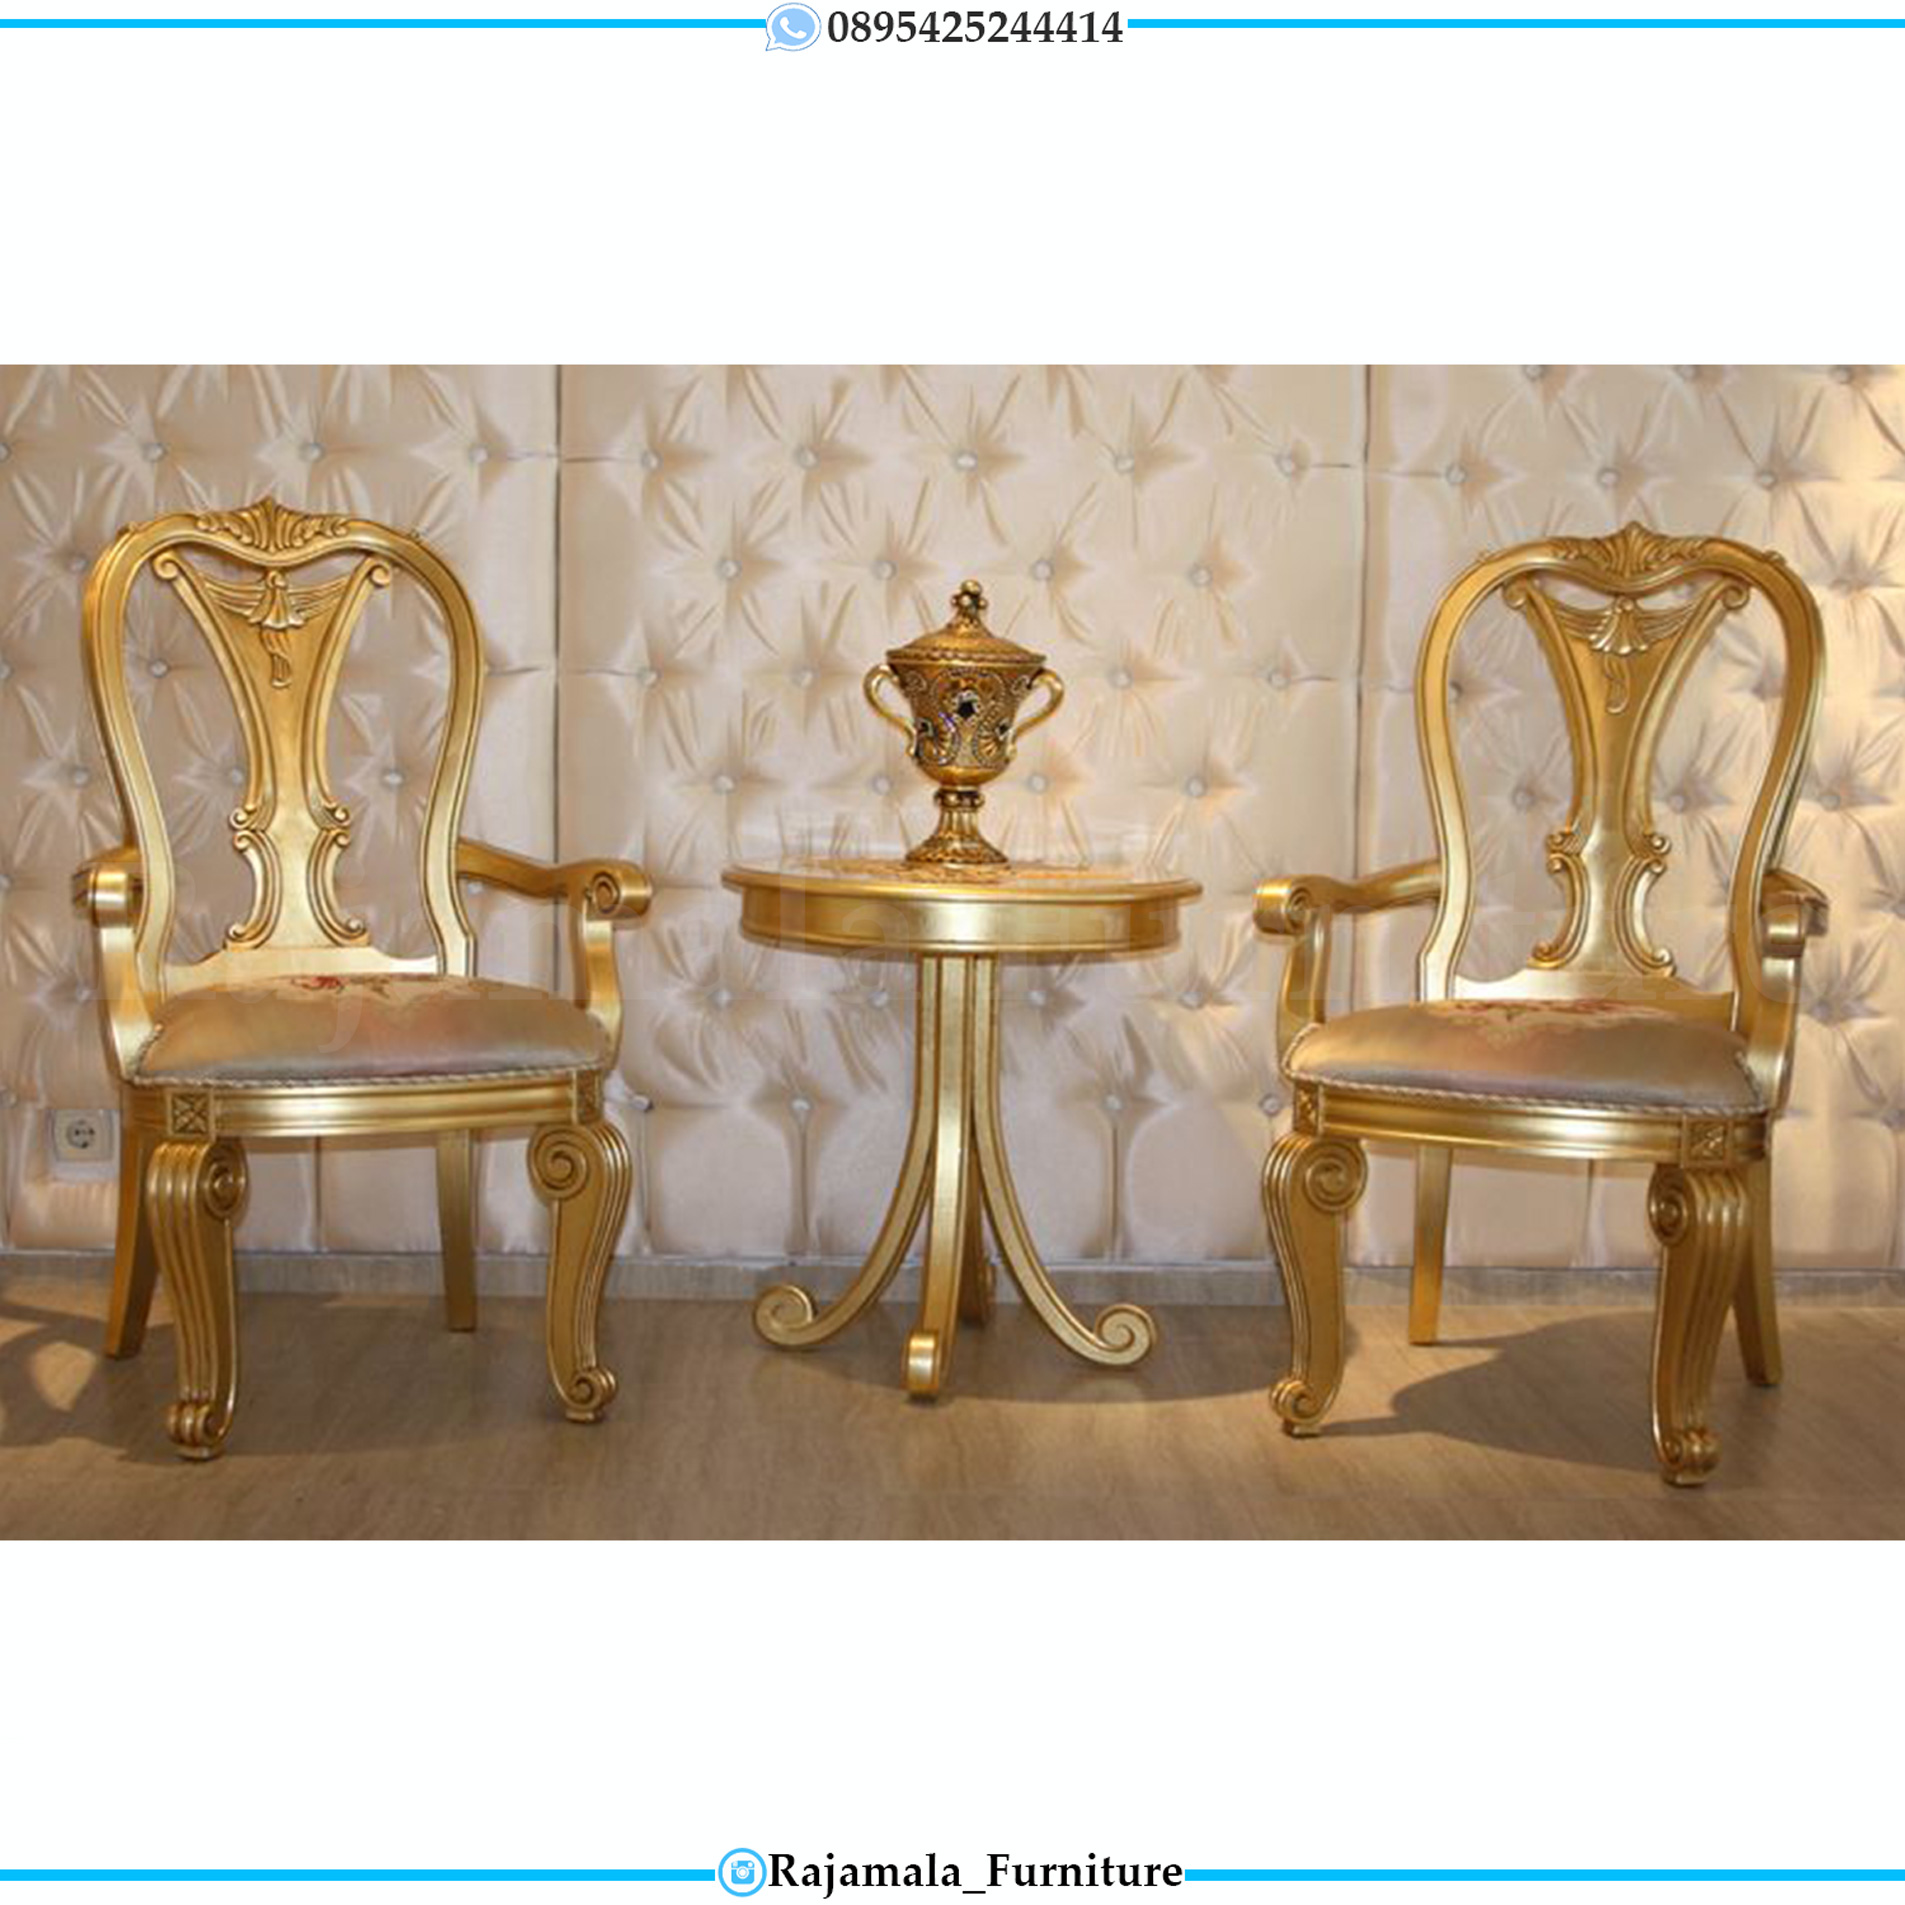 Kursi Teras Ukiran Jepara Golden Shine Color Furniture Jepara Terbaru RM-0022